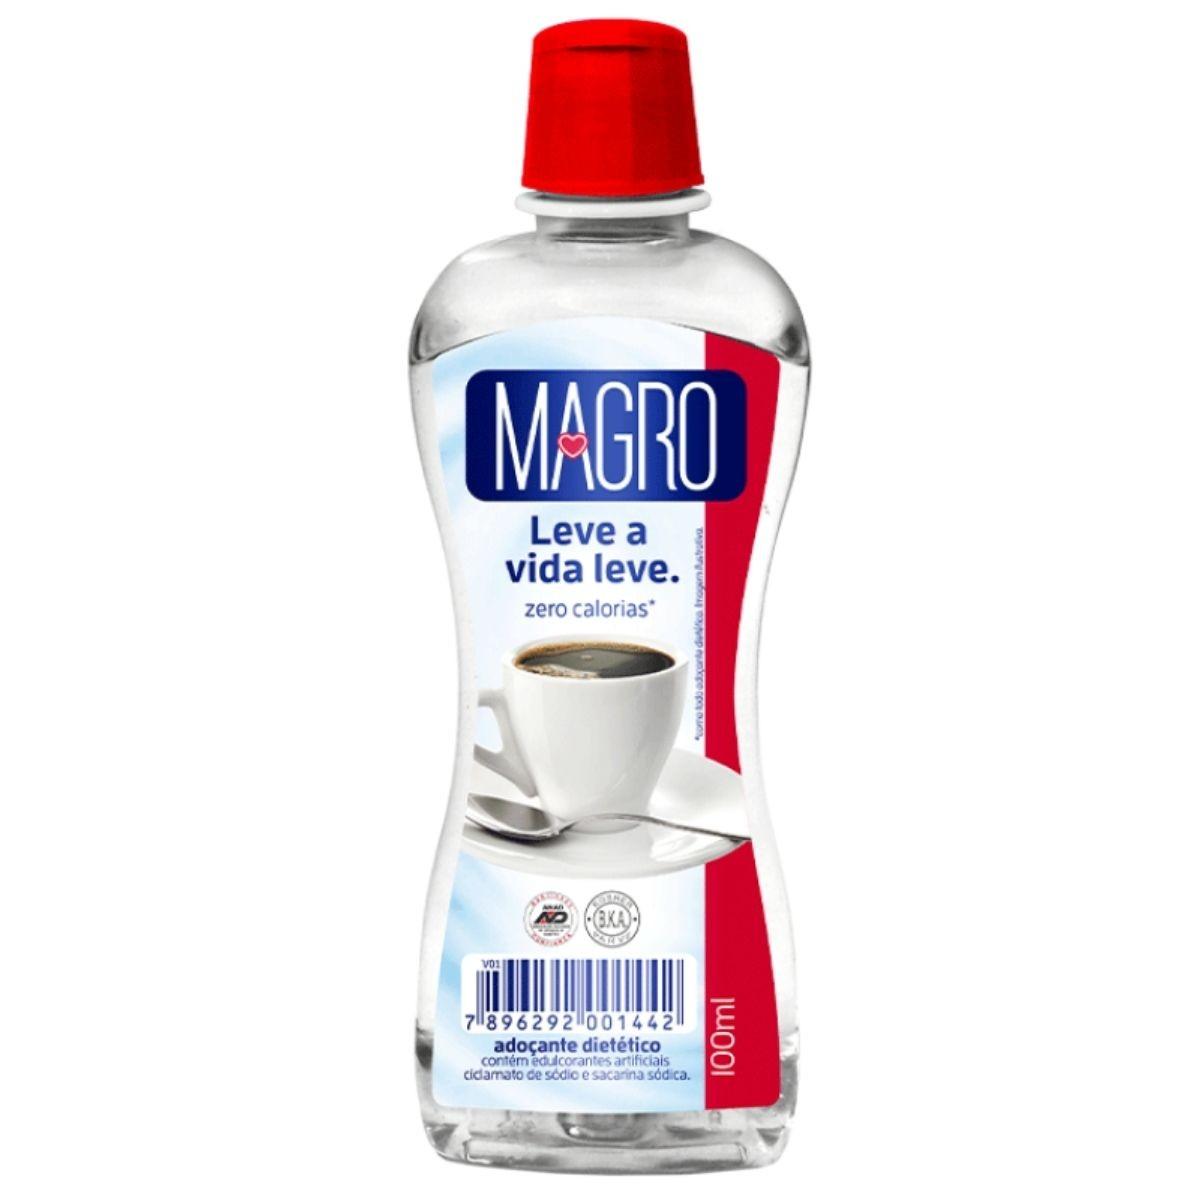 Adoçante Dietético Tradicional Líquido 100ml - Magro